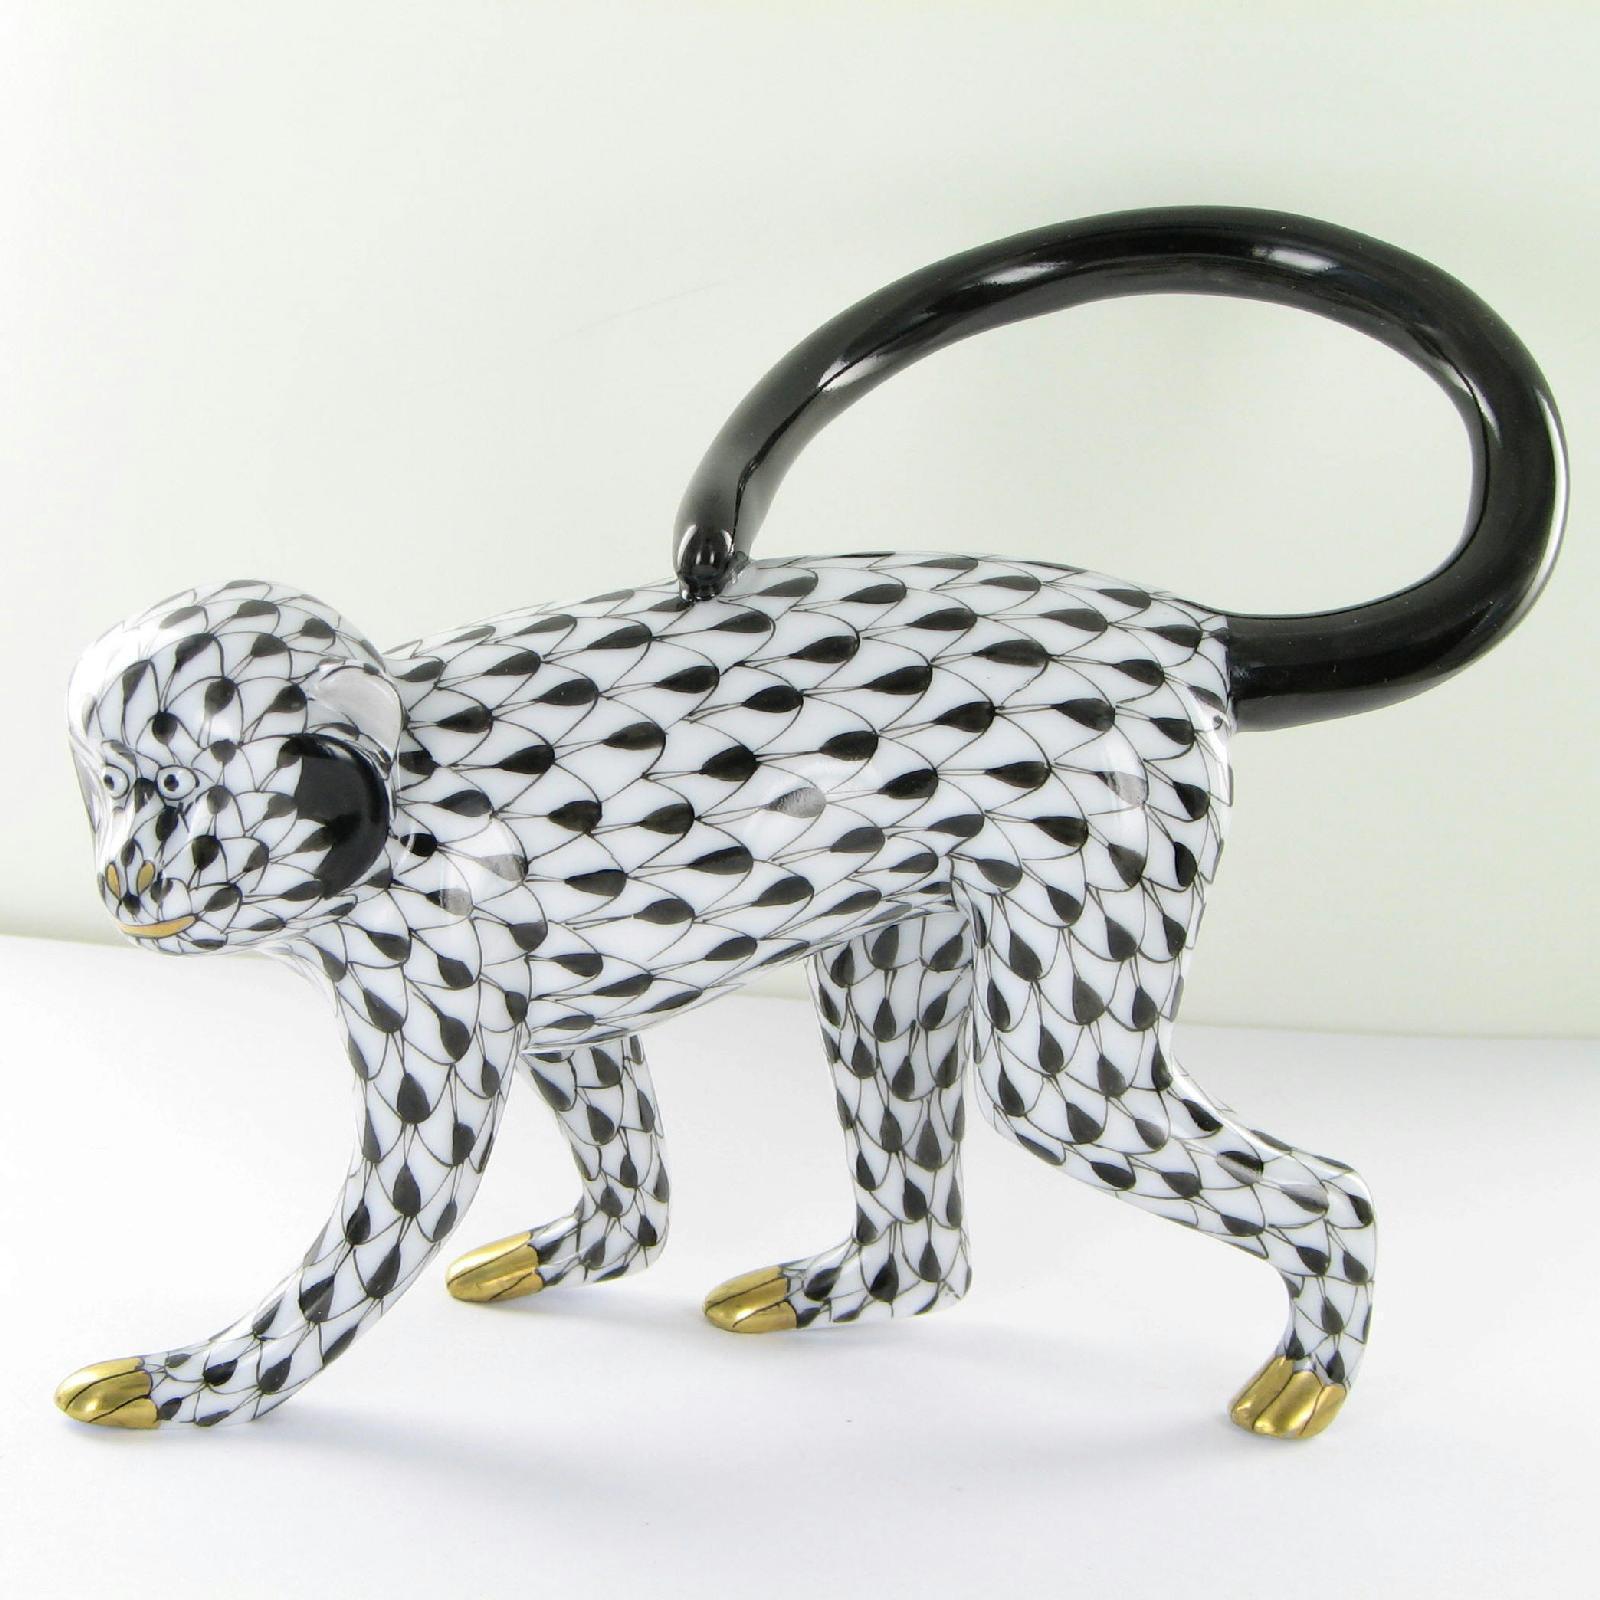 Herend VHP-05355-0-00 Walking Monkey Black Fishnet Curled Back Tail New $350